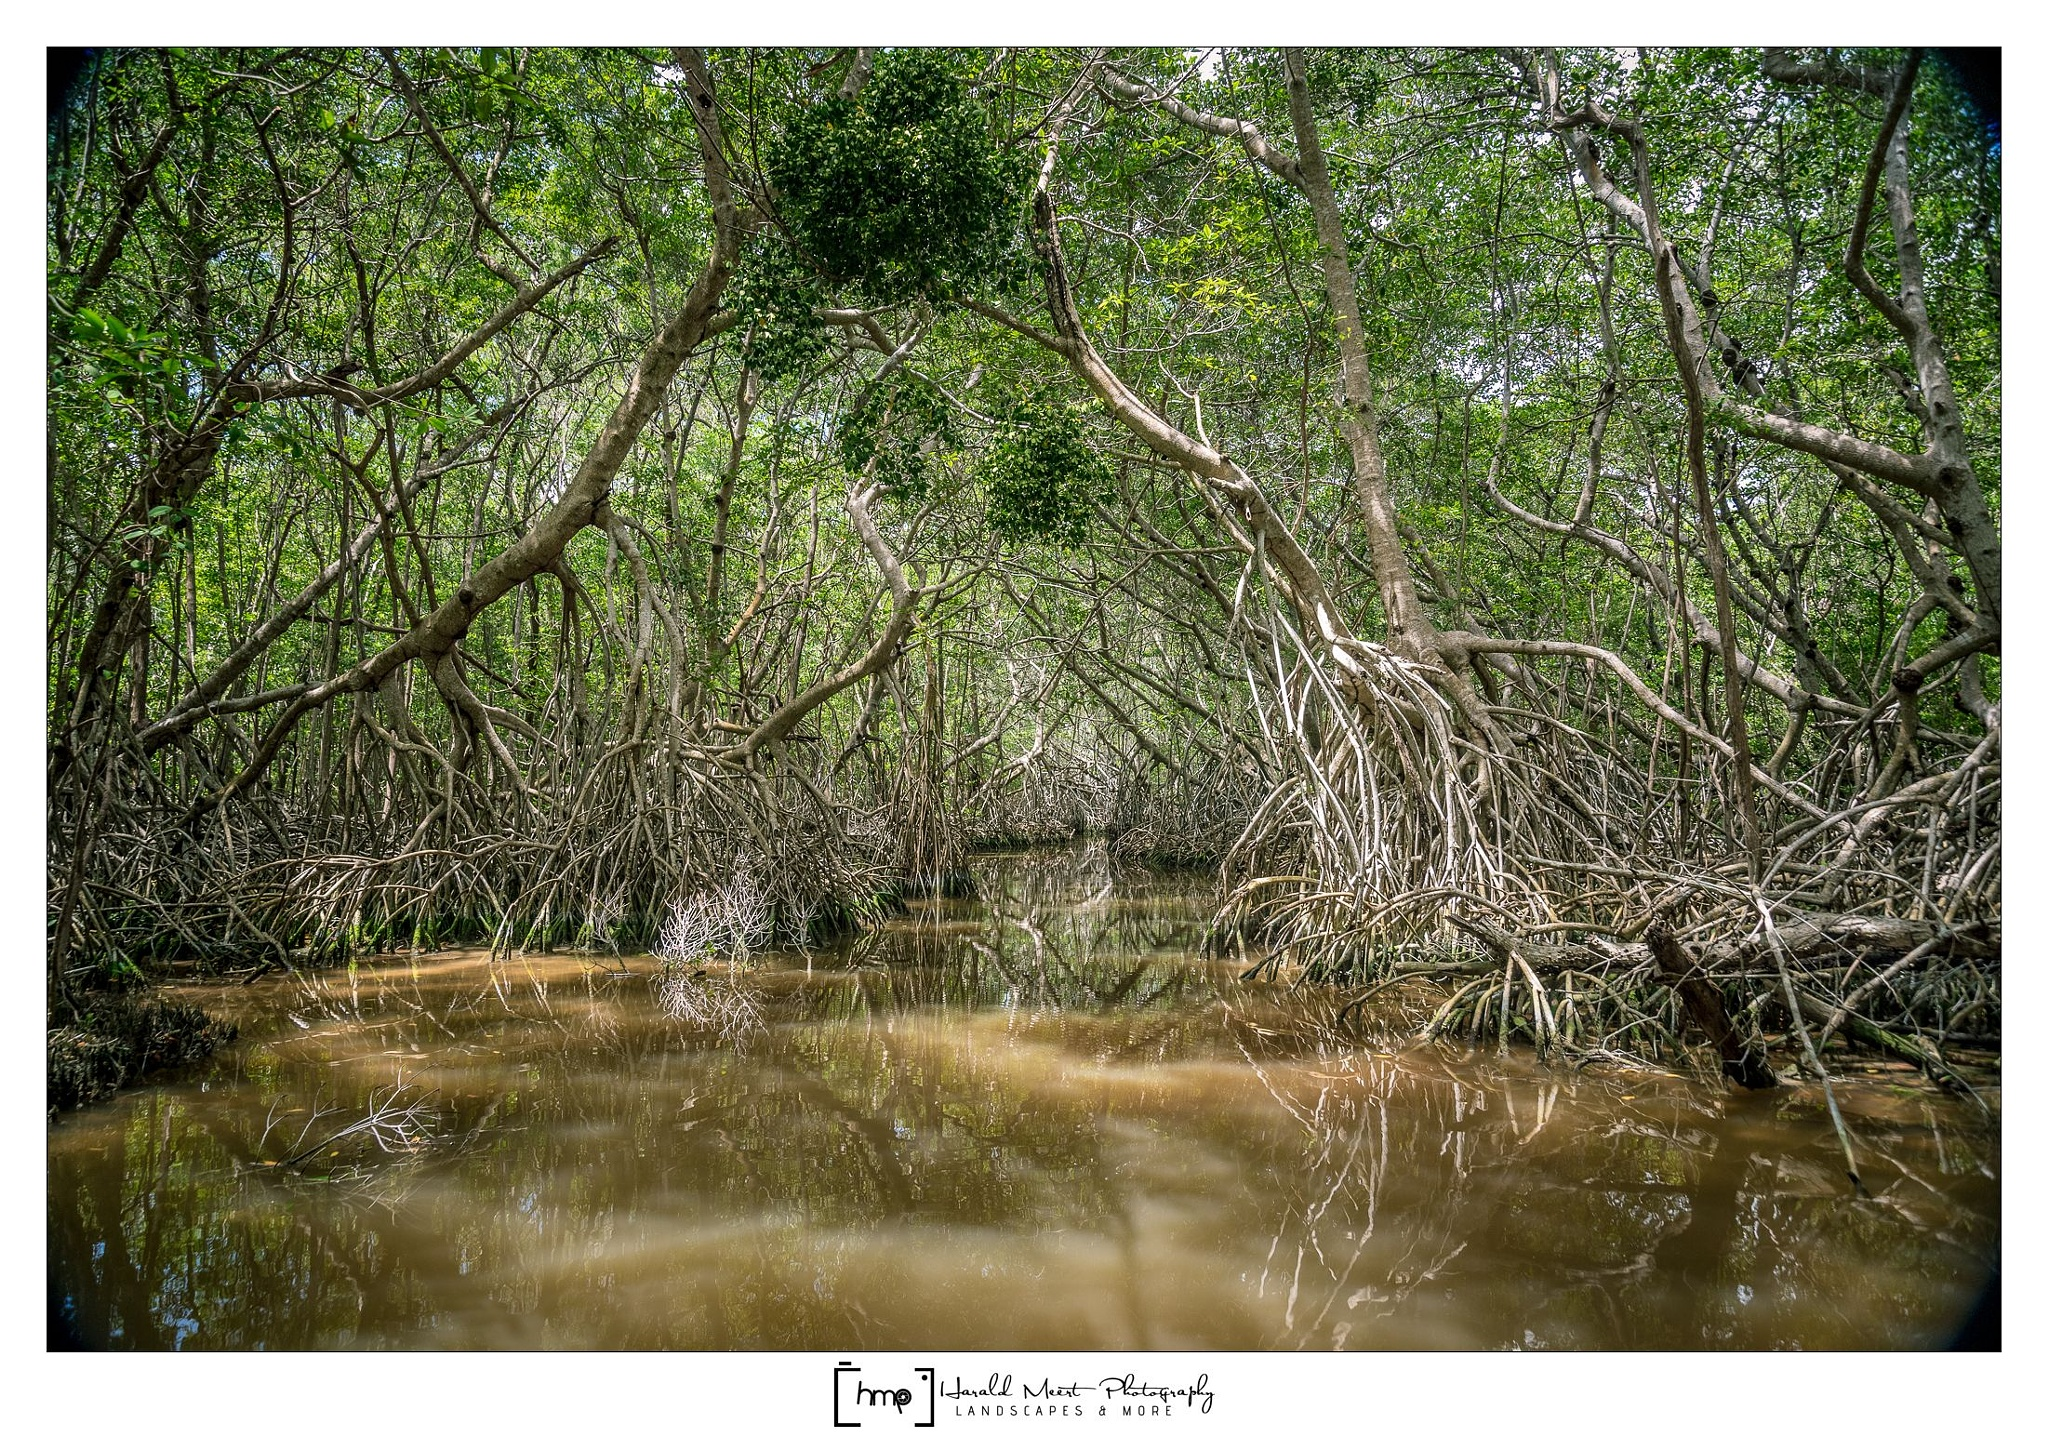 Mangrove (Celestún, Mexico) by HaraldMeert